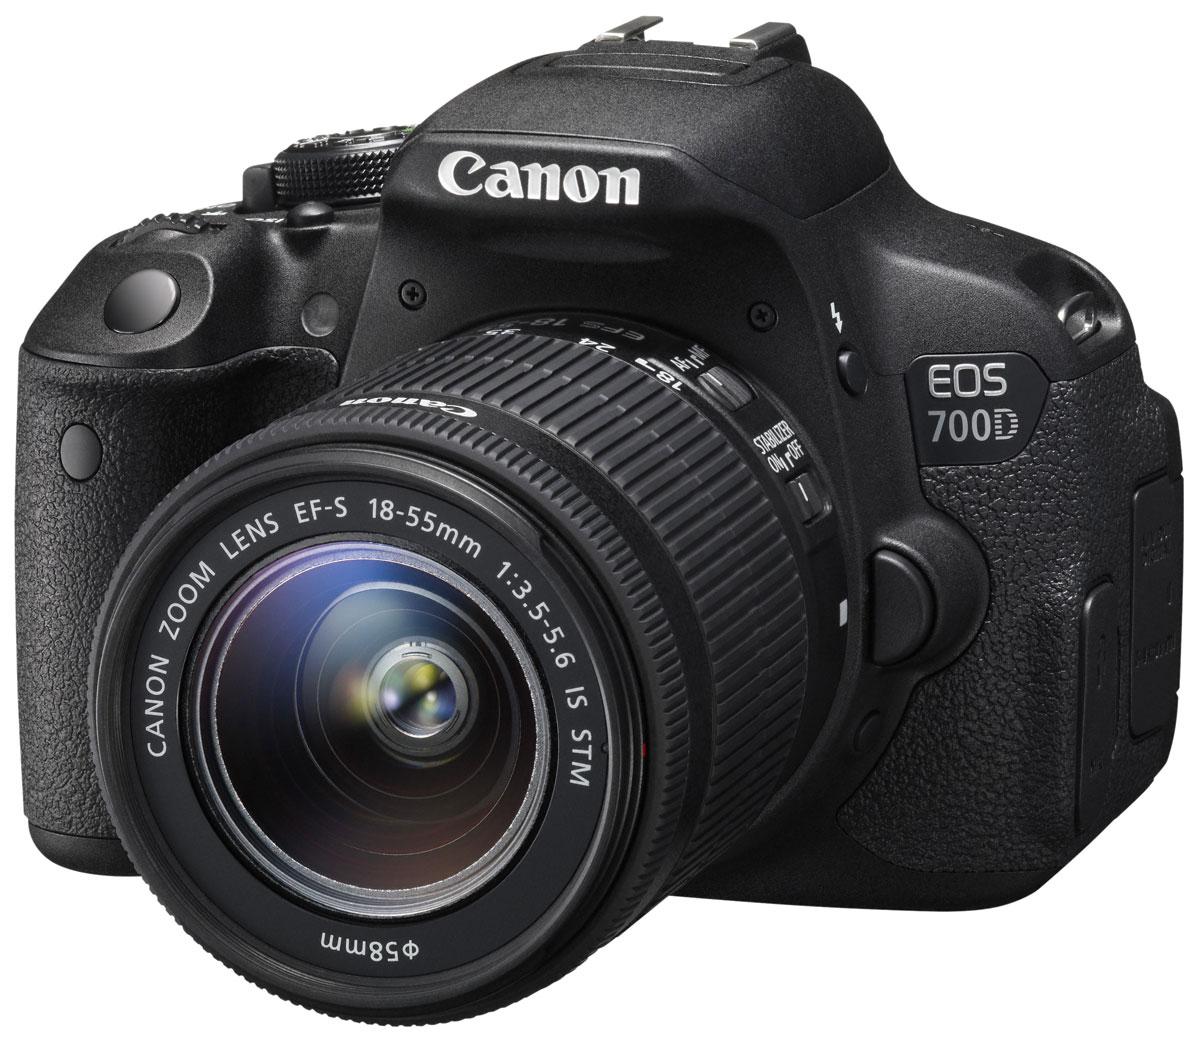 Canon EOS 700D Kit EF-S 18-55 IS STM цифровая зеркальная фотокамера